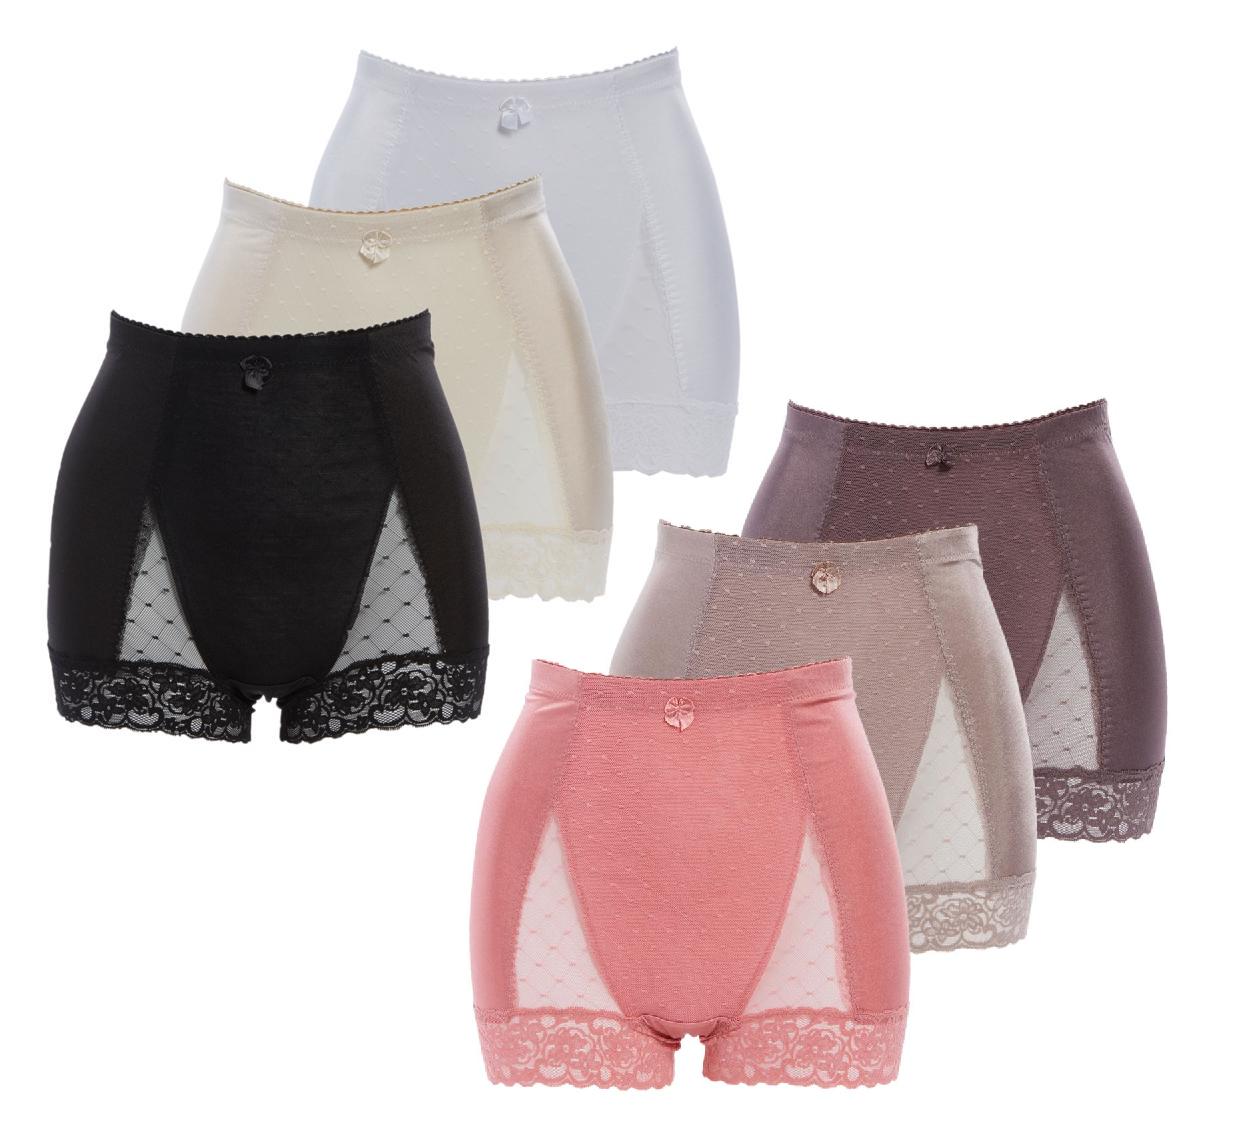 Rhonda Shear Black Floral Lace Smoothing Retro Style Pin Up Panties New